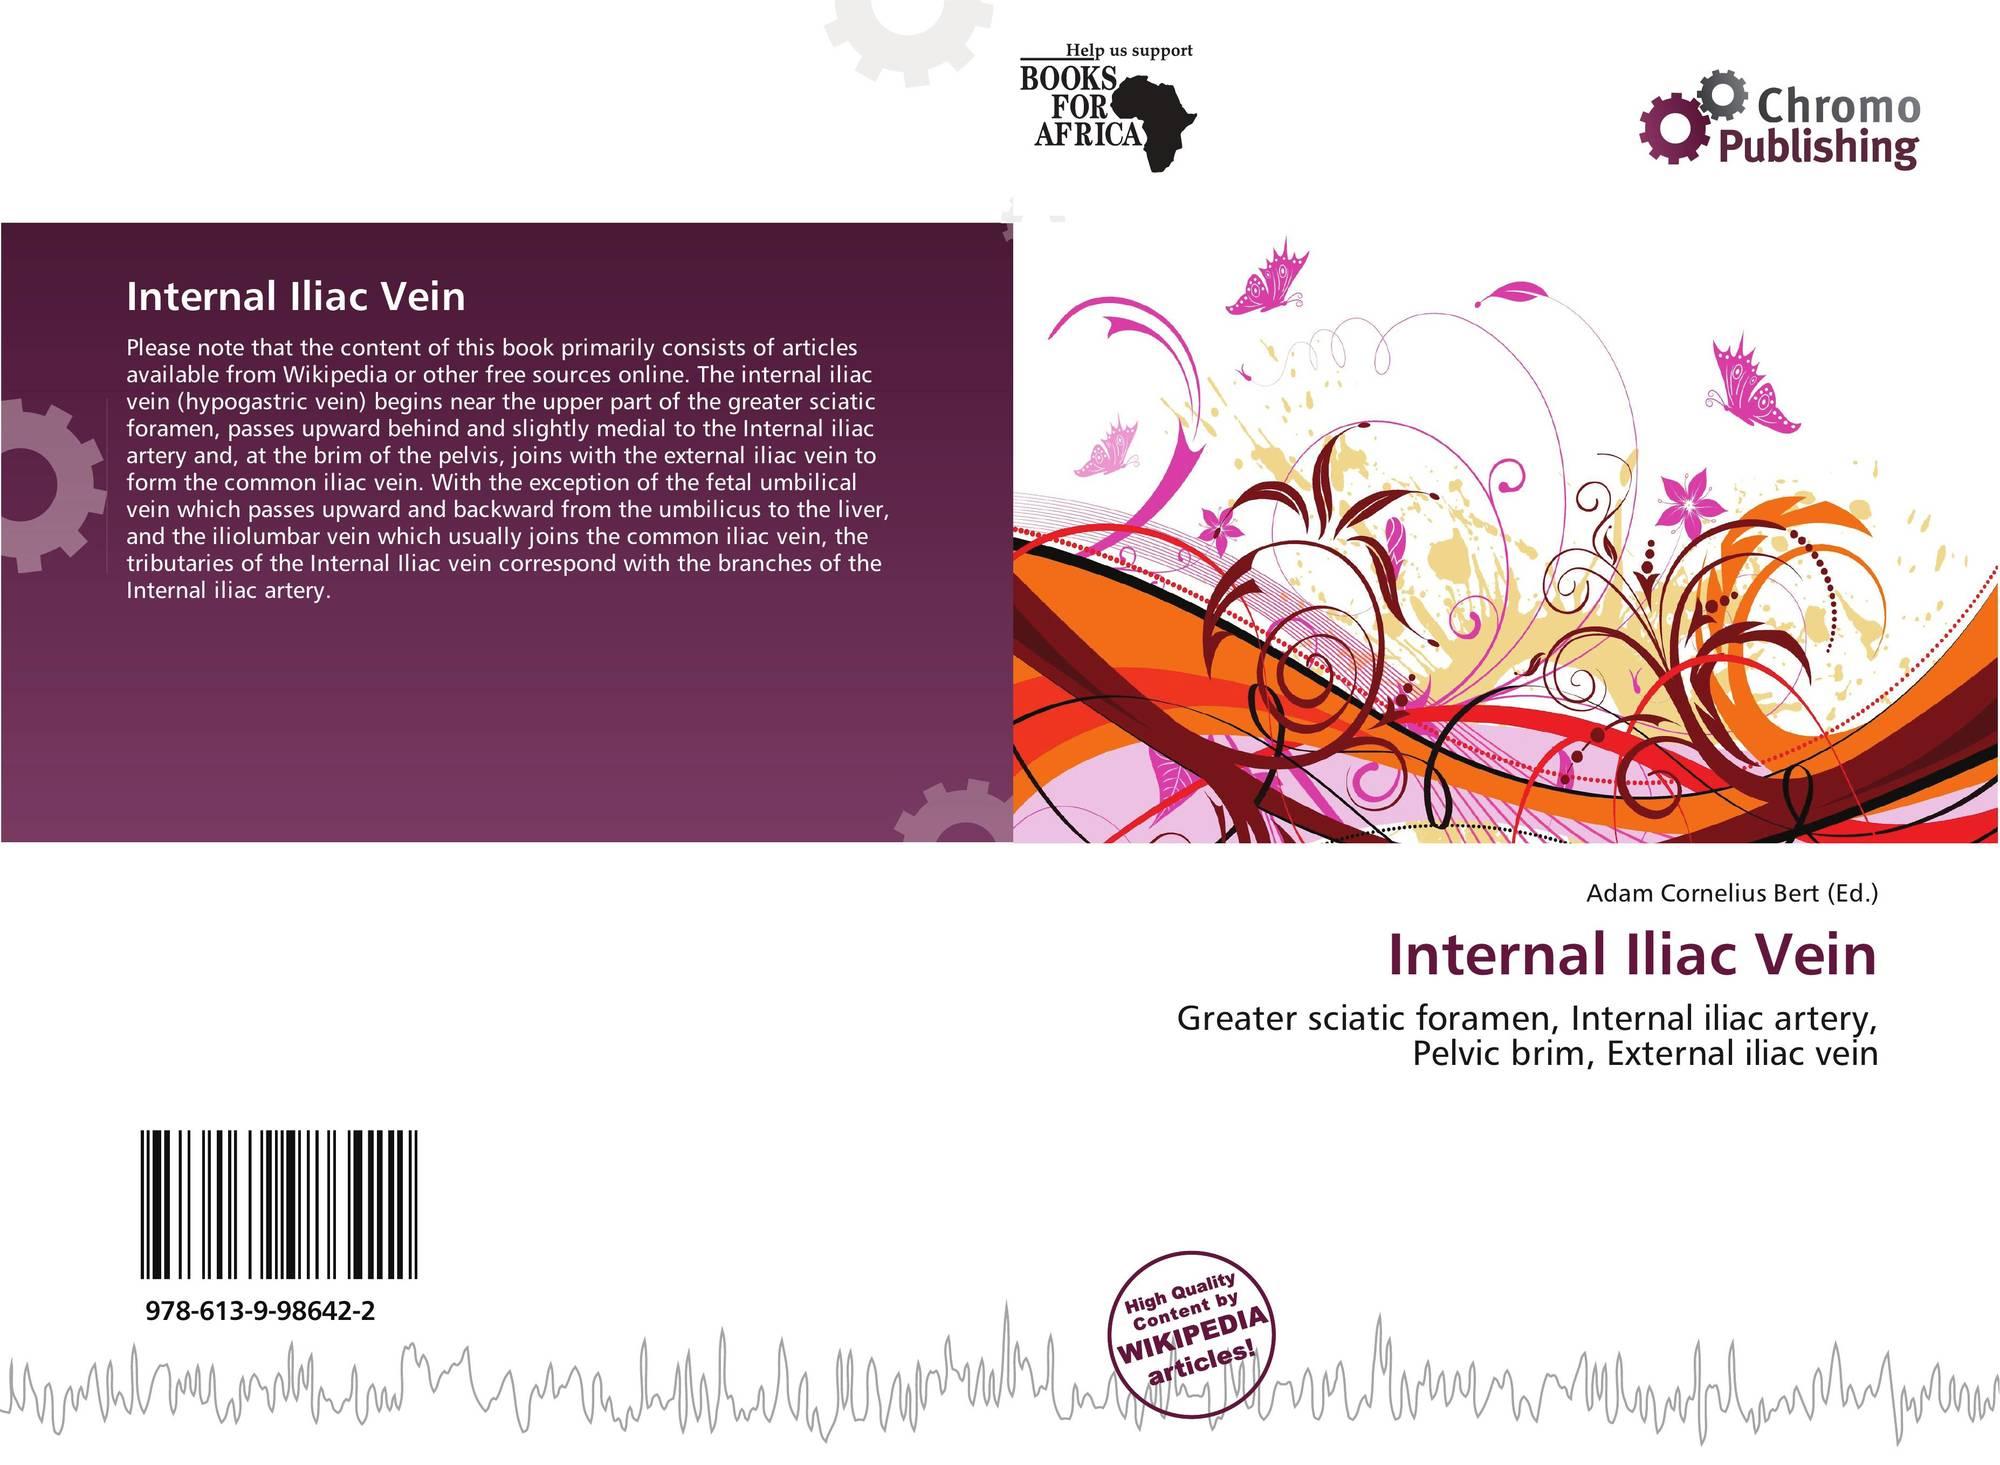 Internal Iliac Vein 978 613 9 98642 2 6139986427 9786139986422